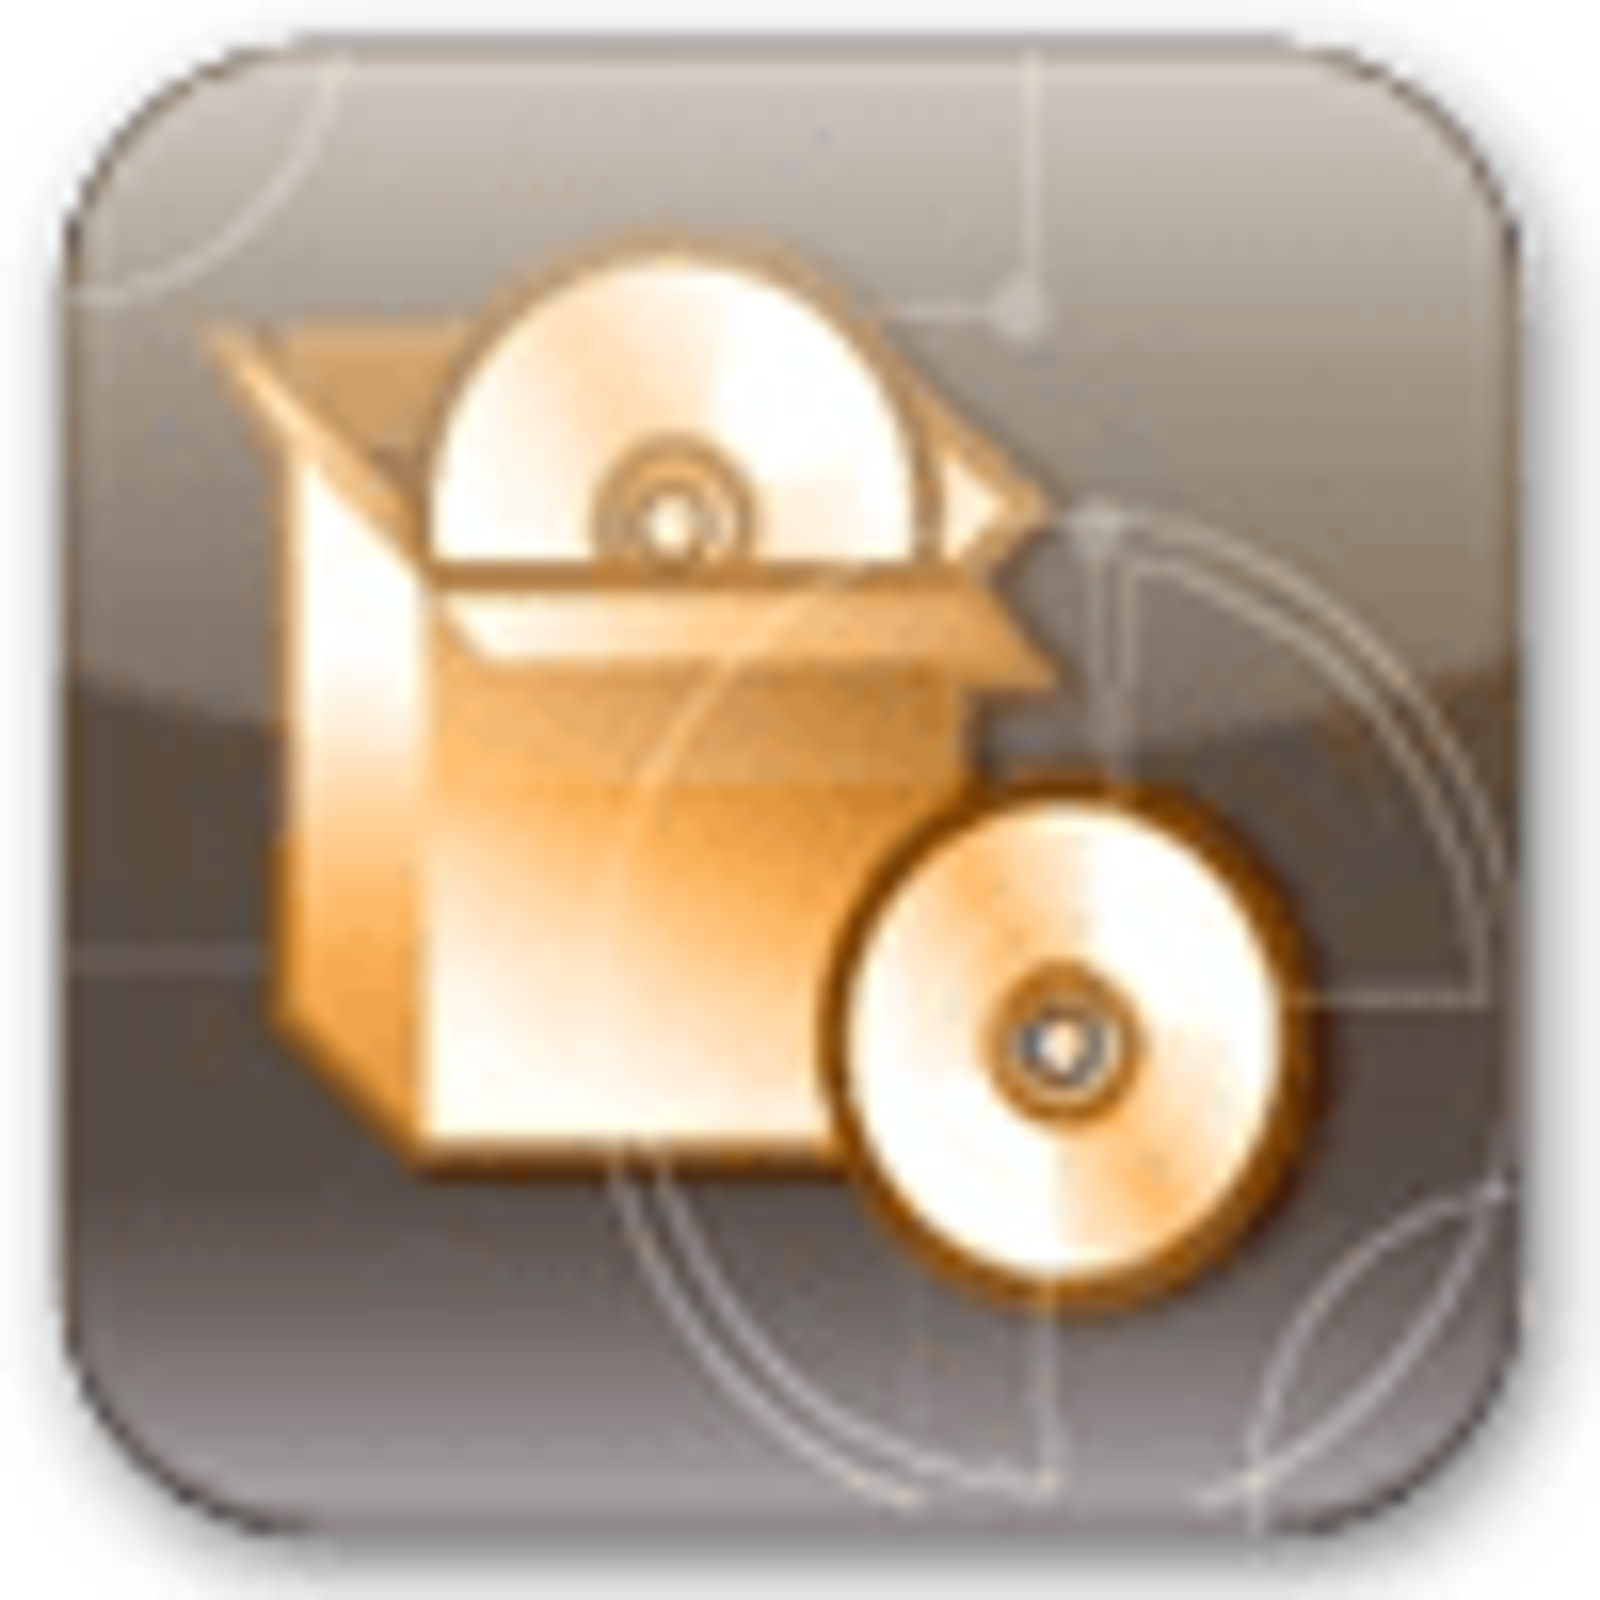 Bluetooth OBEX File Transfer